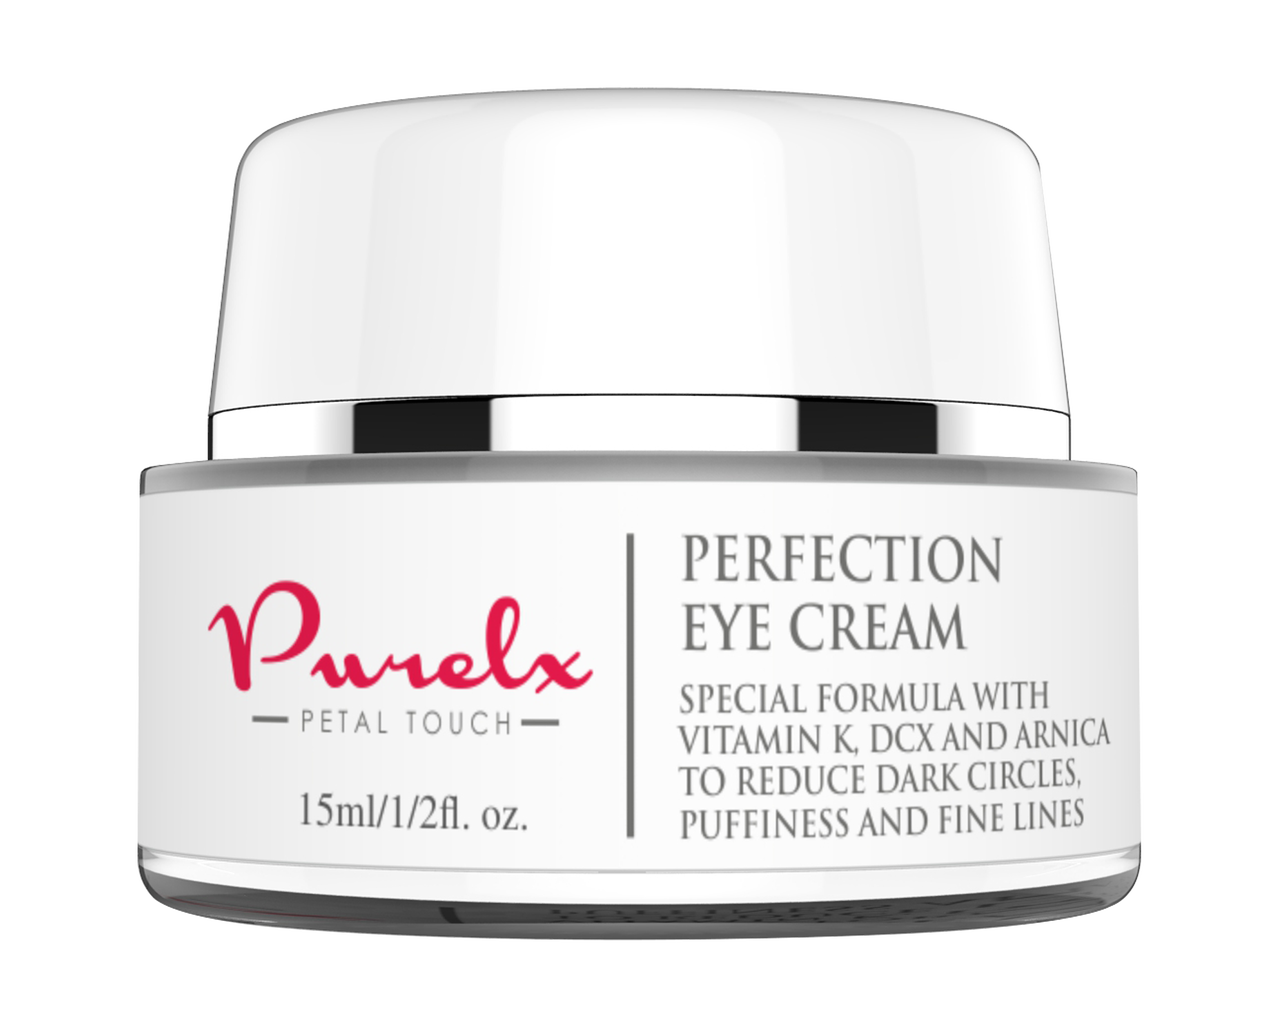 Perfection Eye Cream